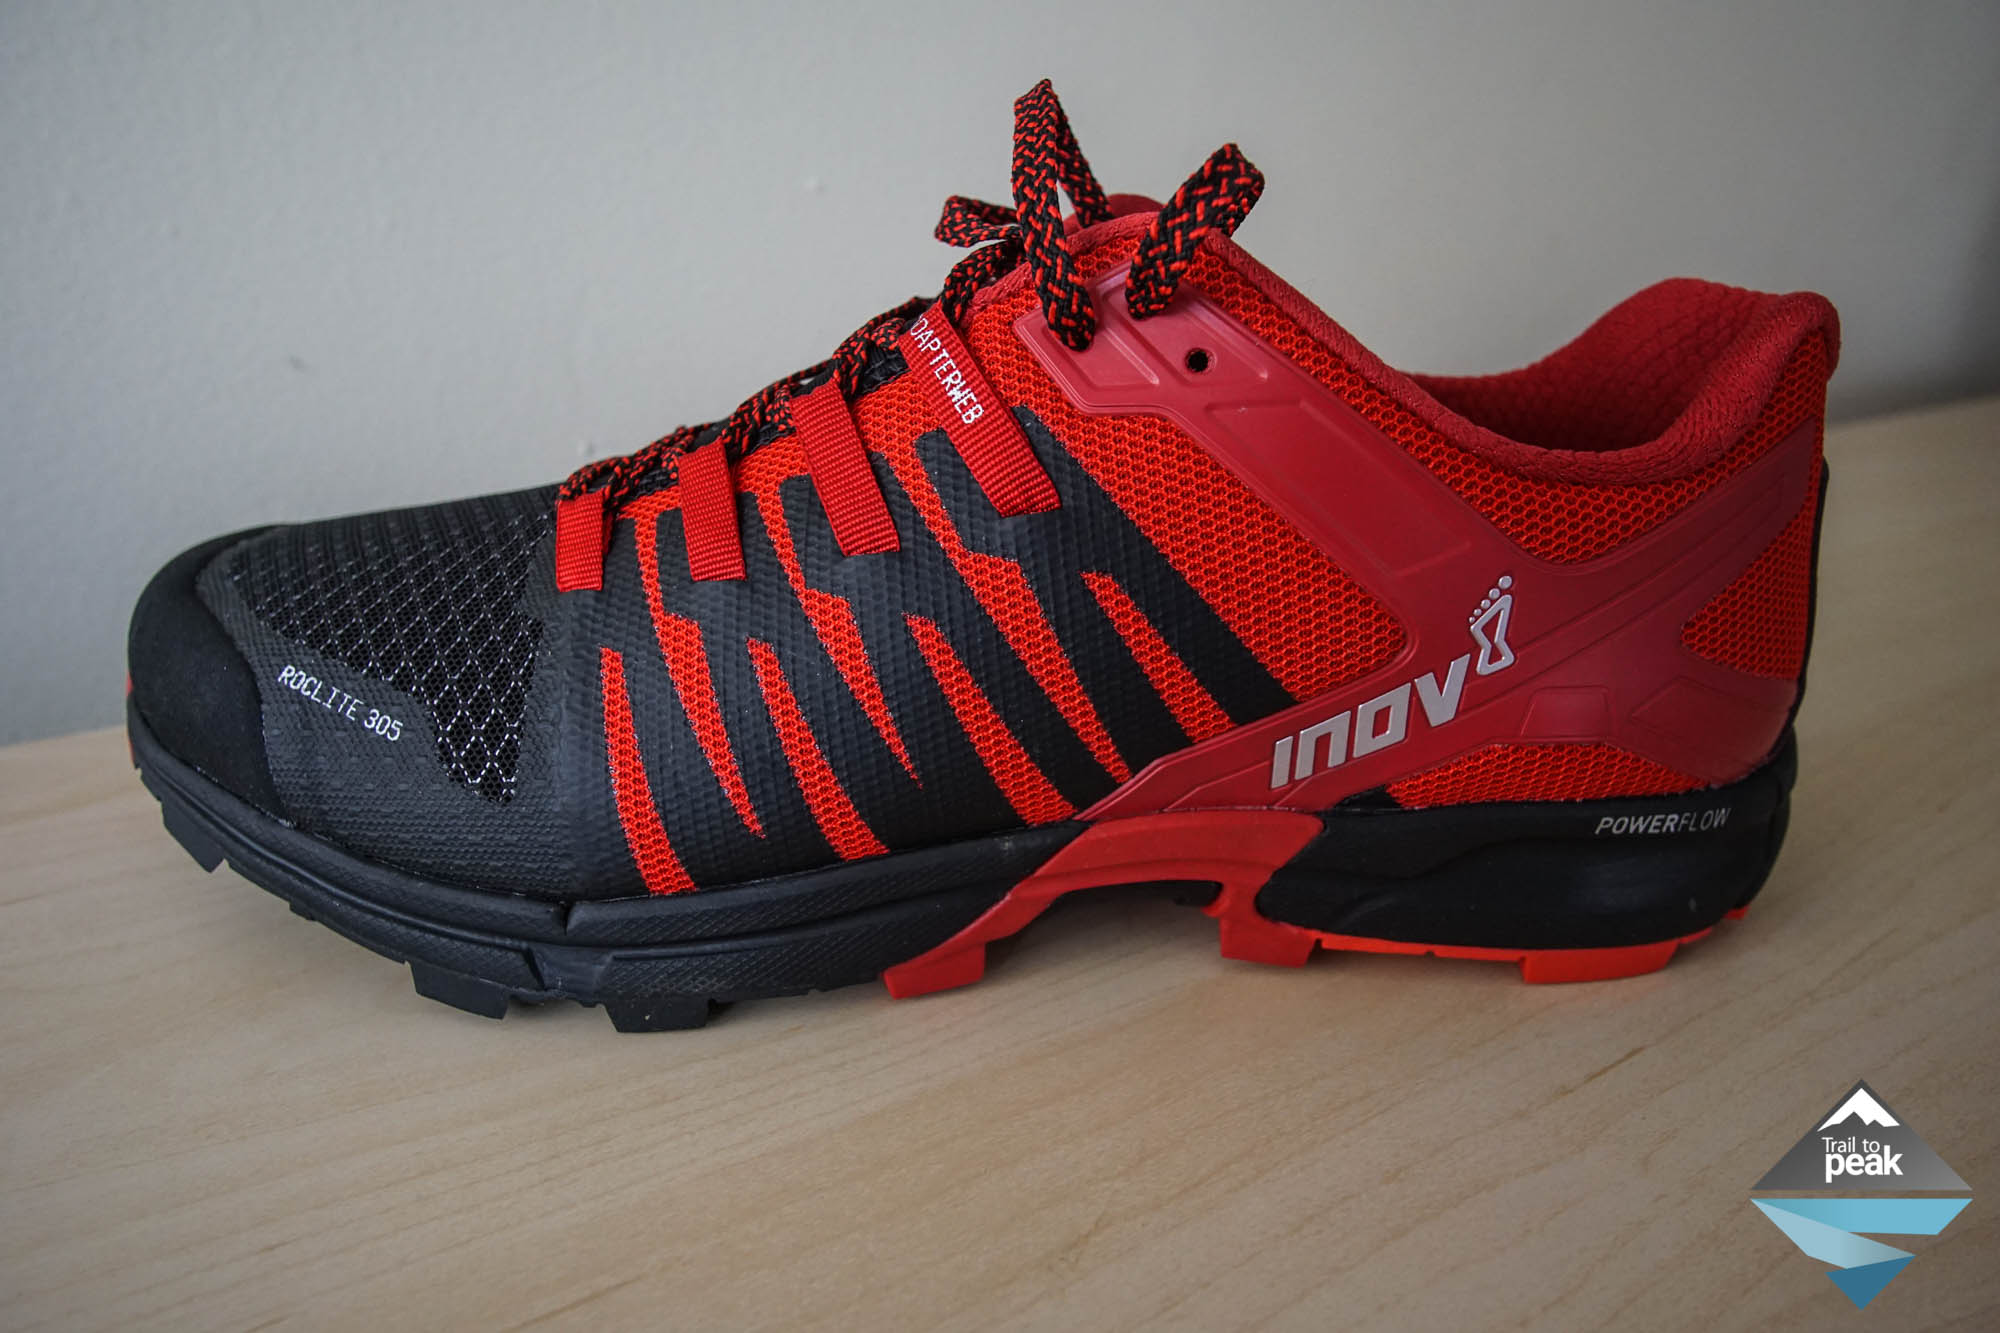 new style 02fa0 2edad Gear Preview: Inov-8 Roclite 305 Trail Shoe - Trail to Peak